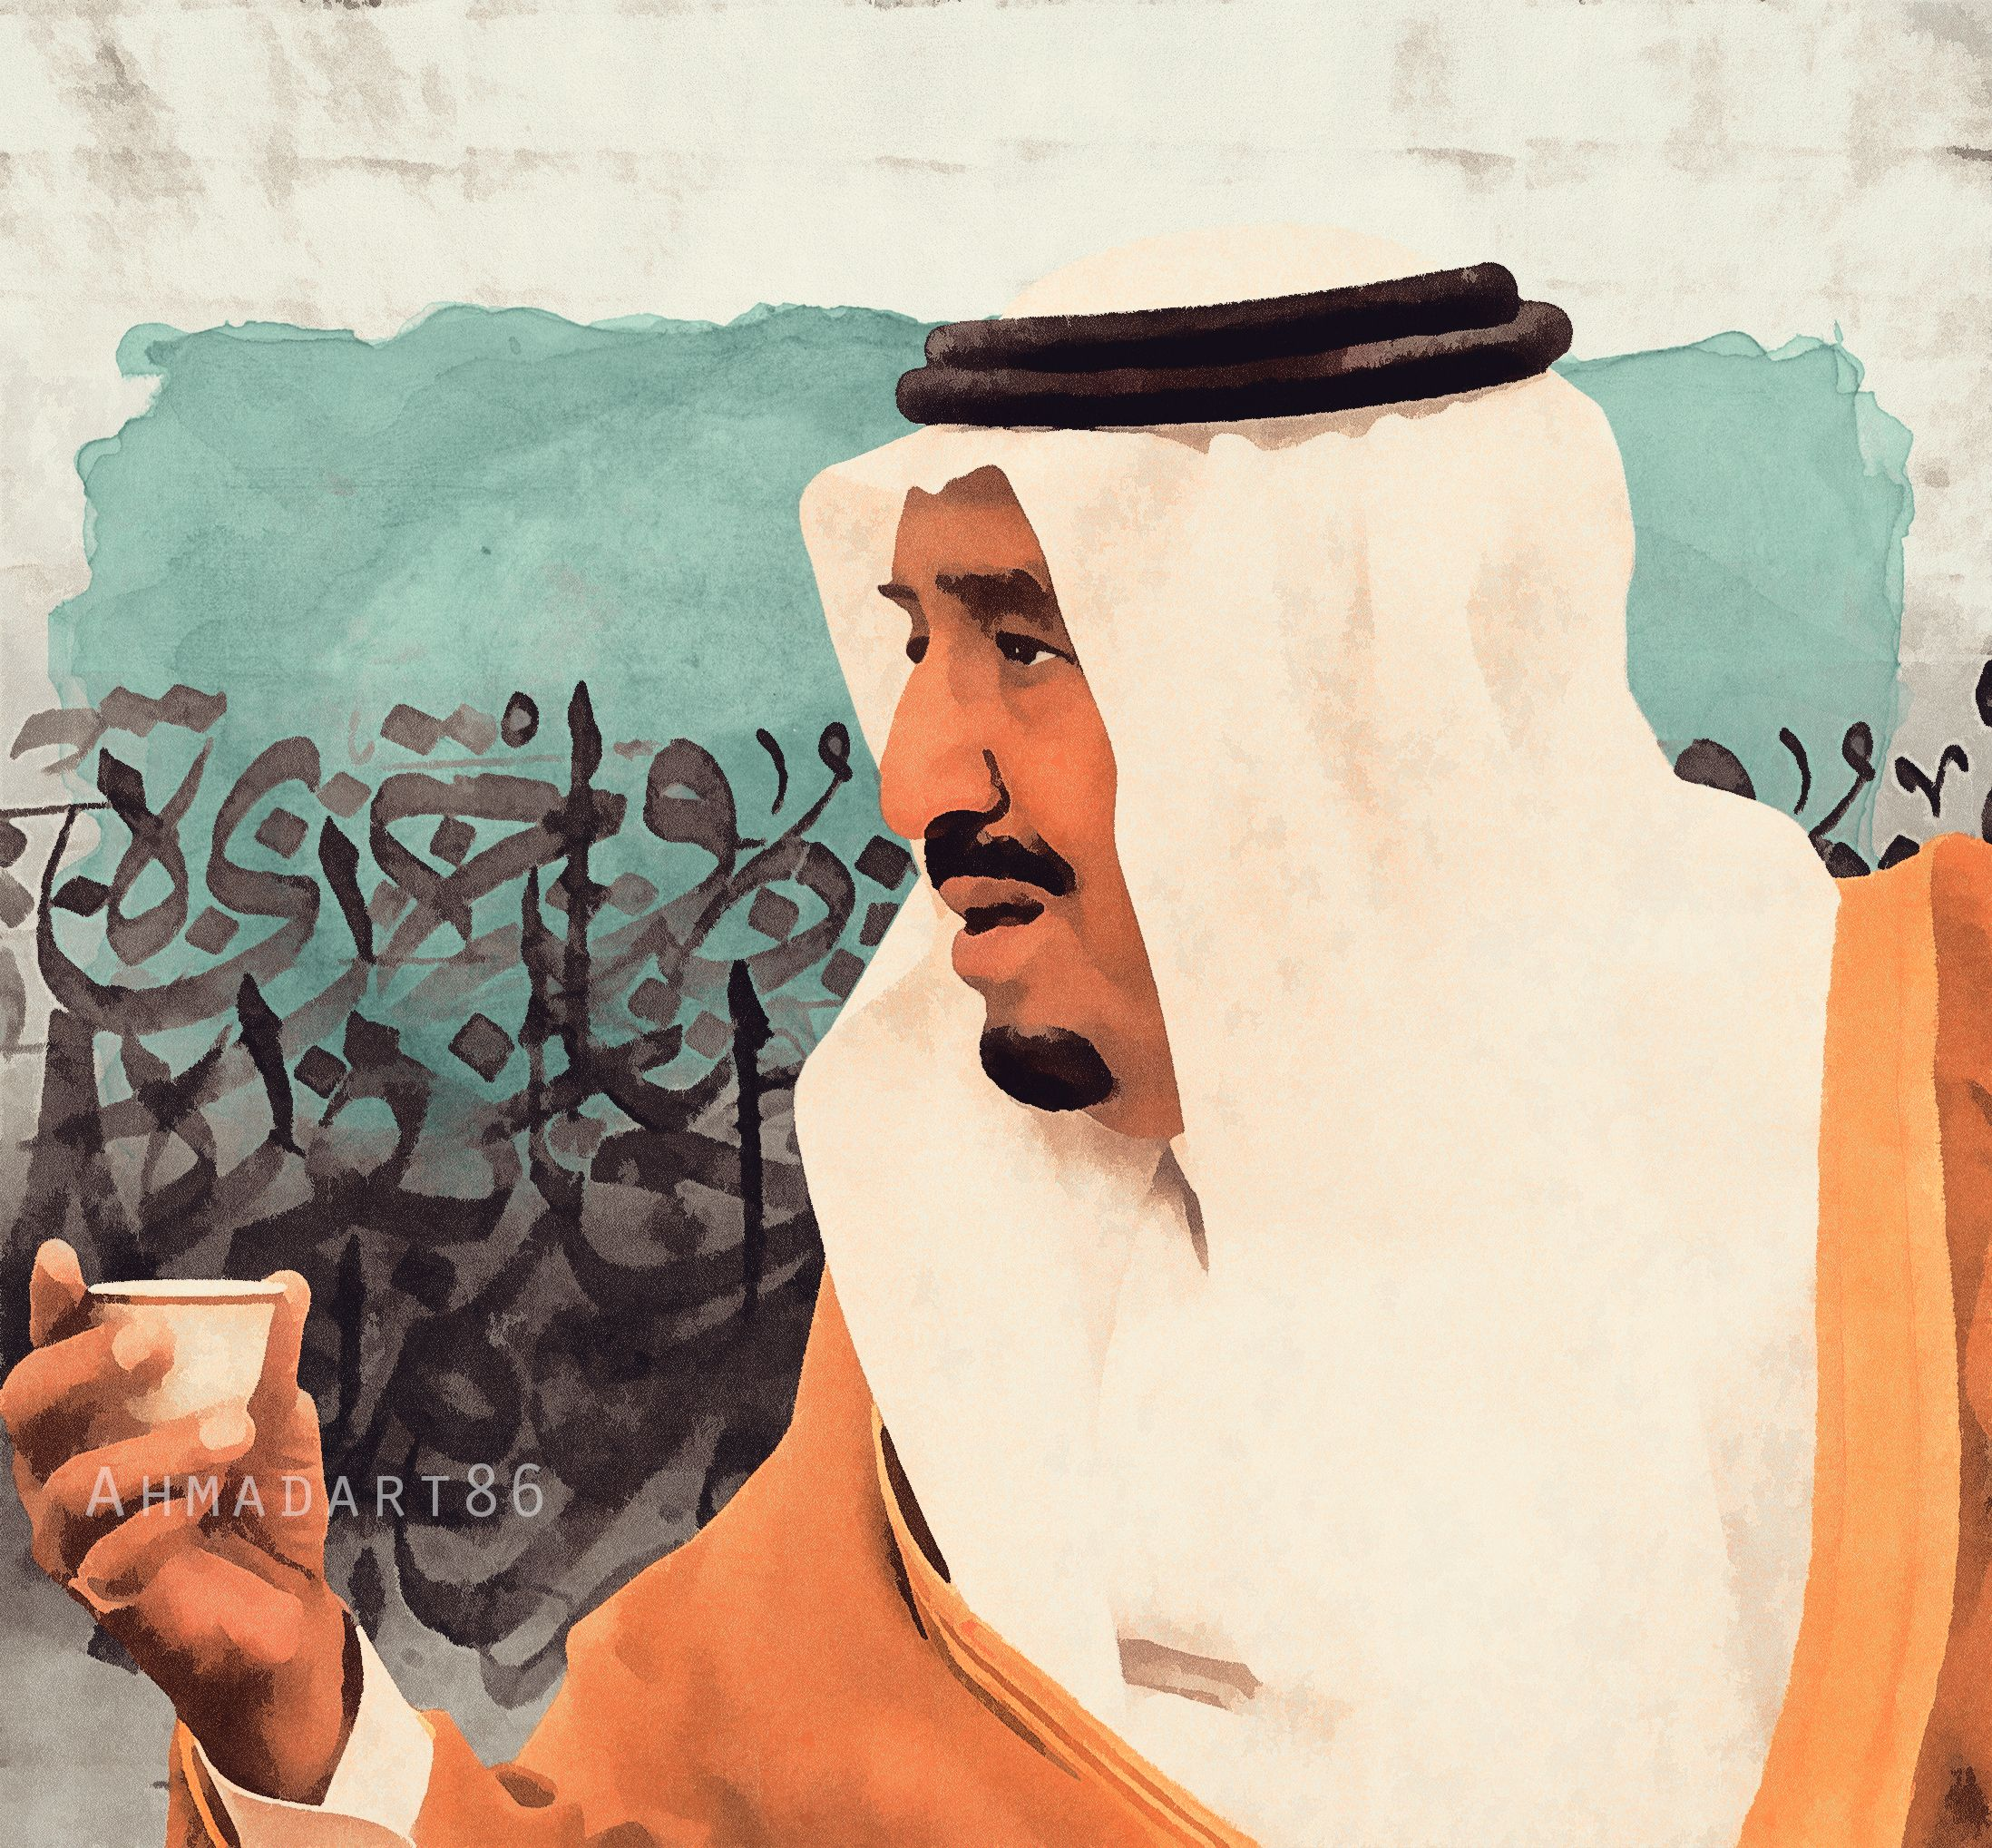 Pin By Xdon On My Designs Arabic Art Art Creative Artwork